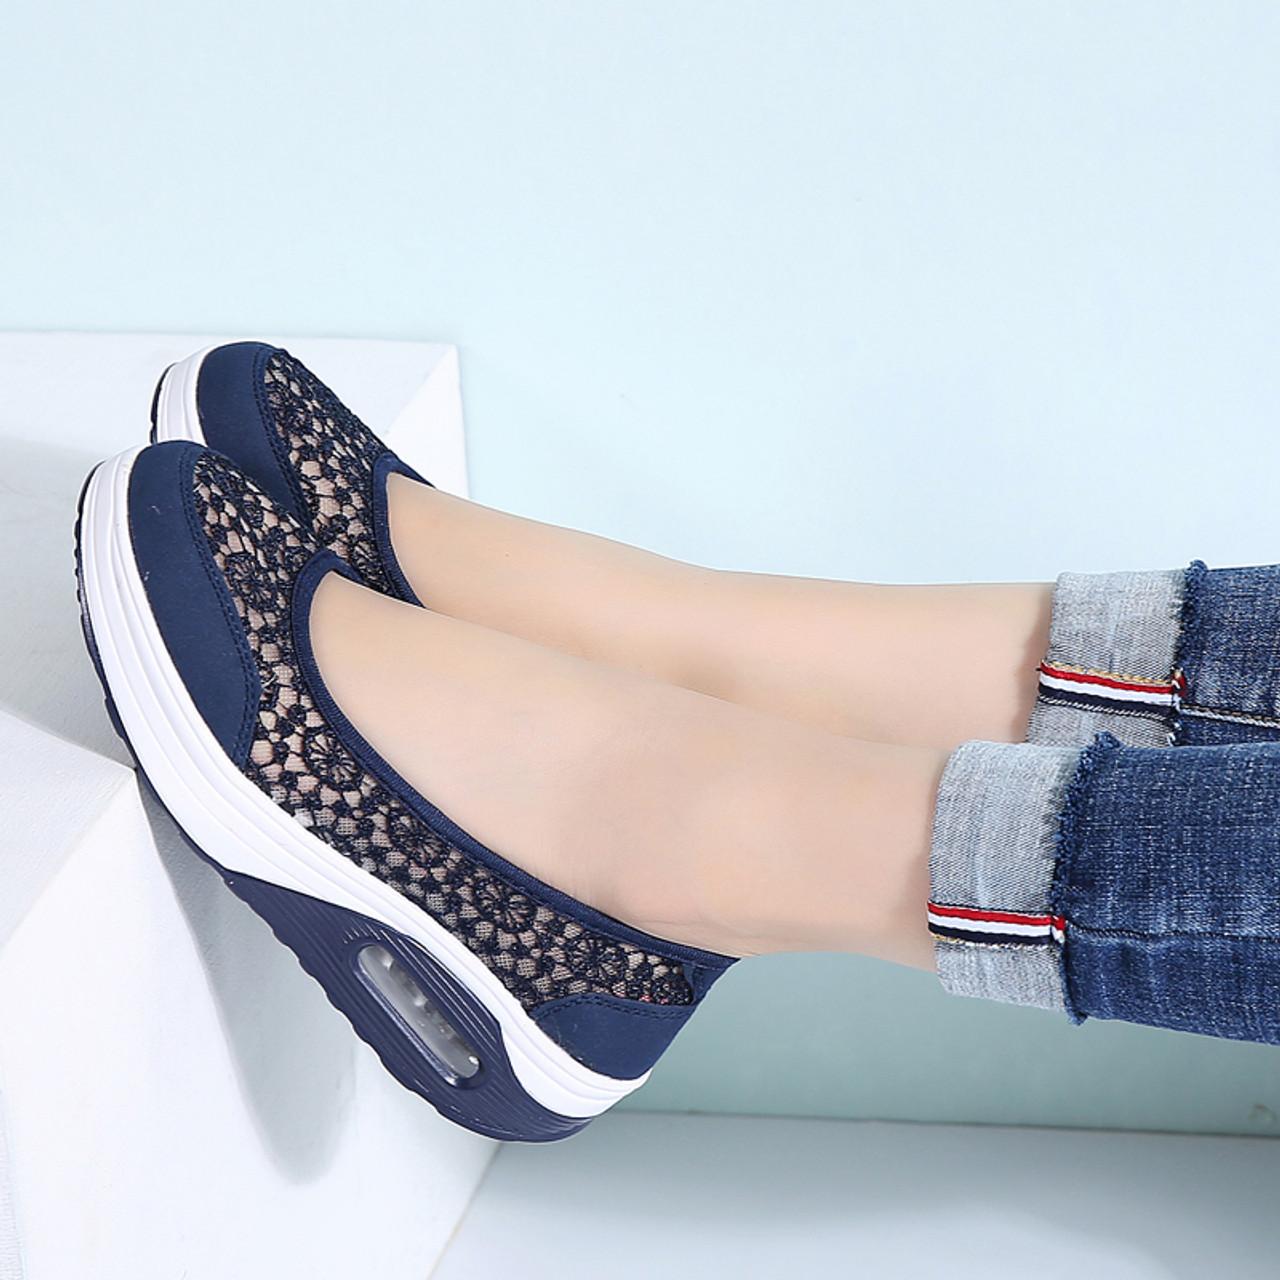 8174ec445cf59 ... STQ 2019 Summer women flat platform shoes women breathable mesh casual  sneakers shoes ladies slip on ...